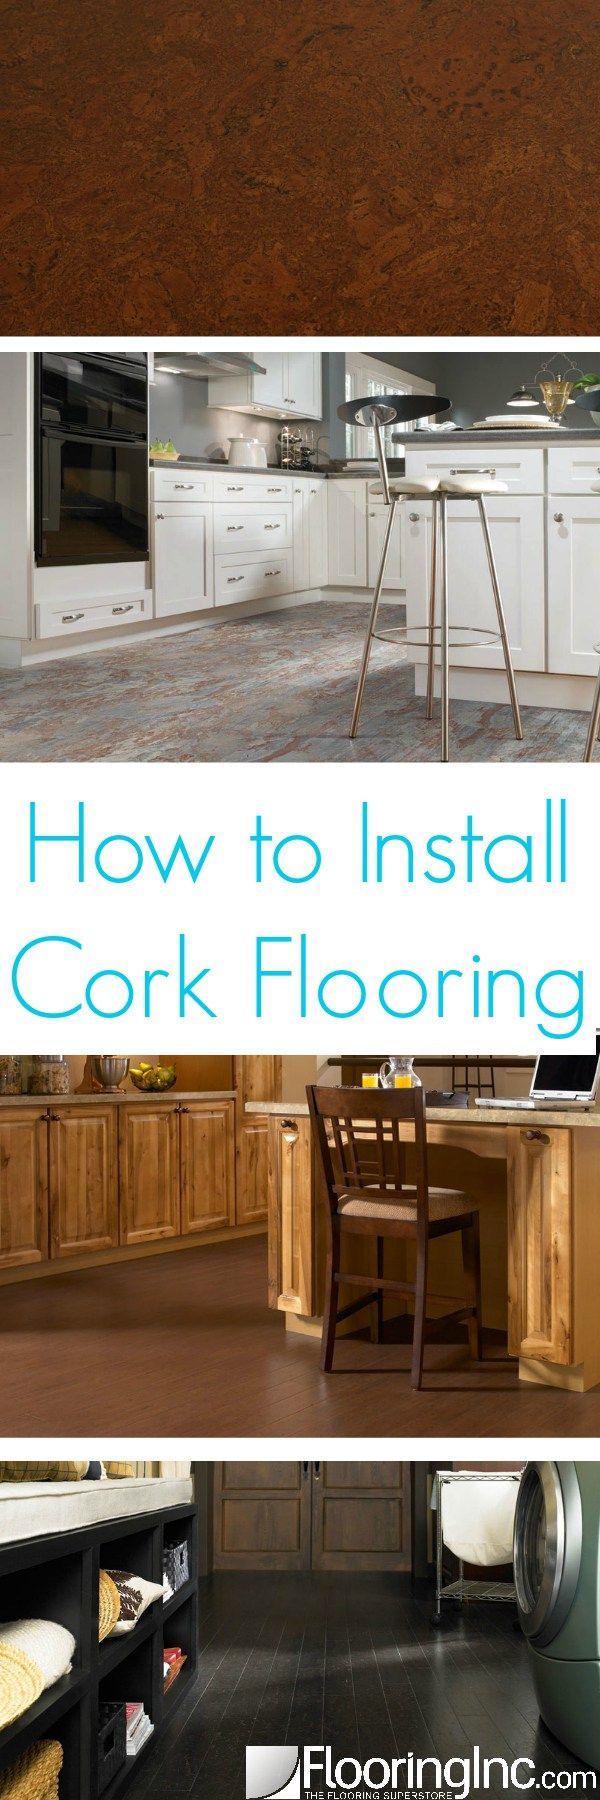 41 best cork flooring images on pinterest | flooring ideas, cork